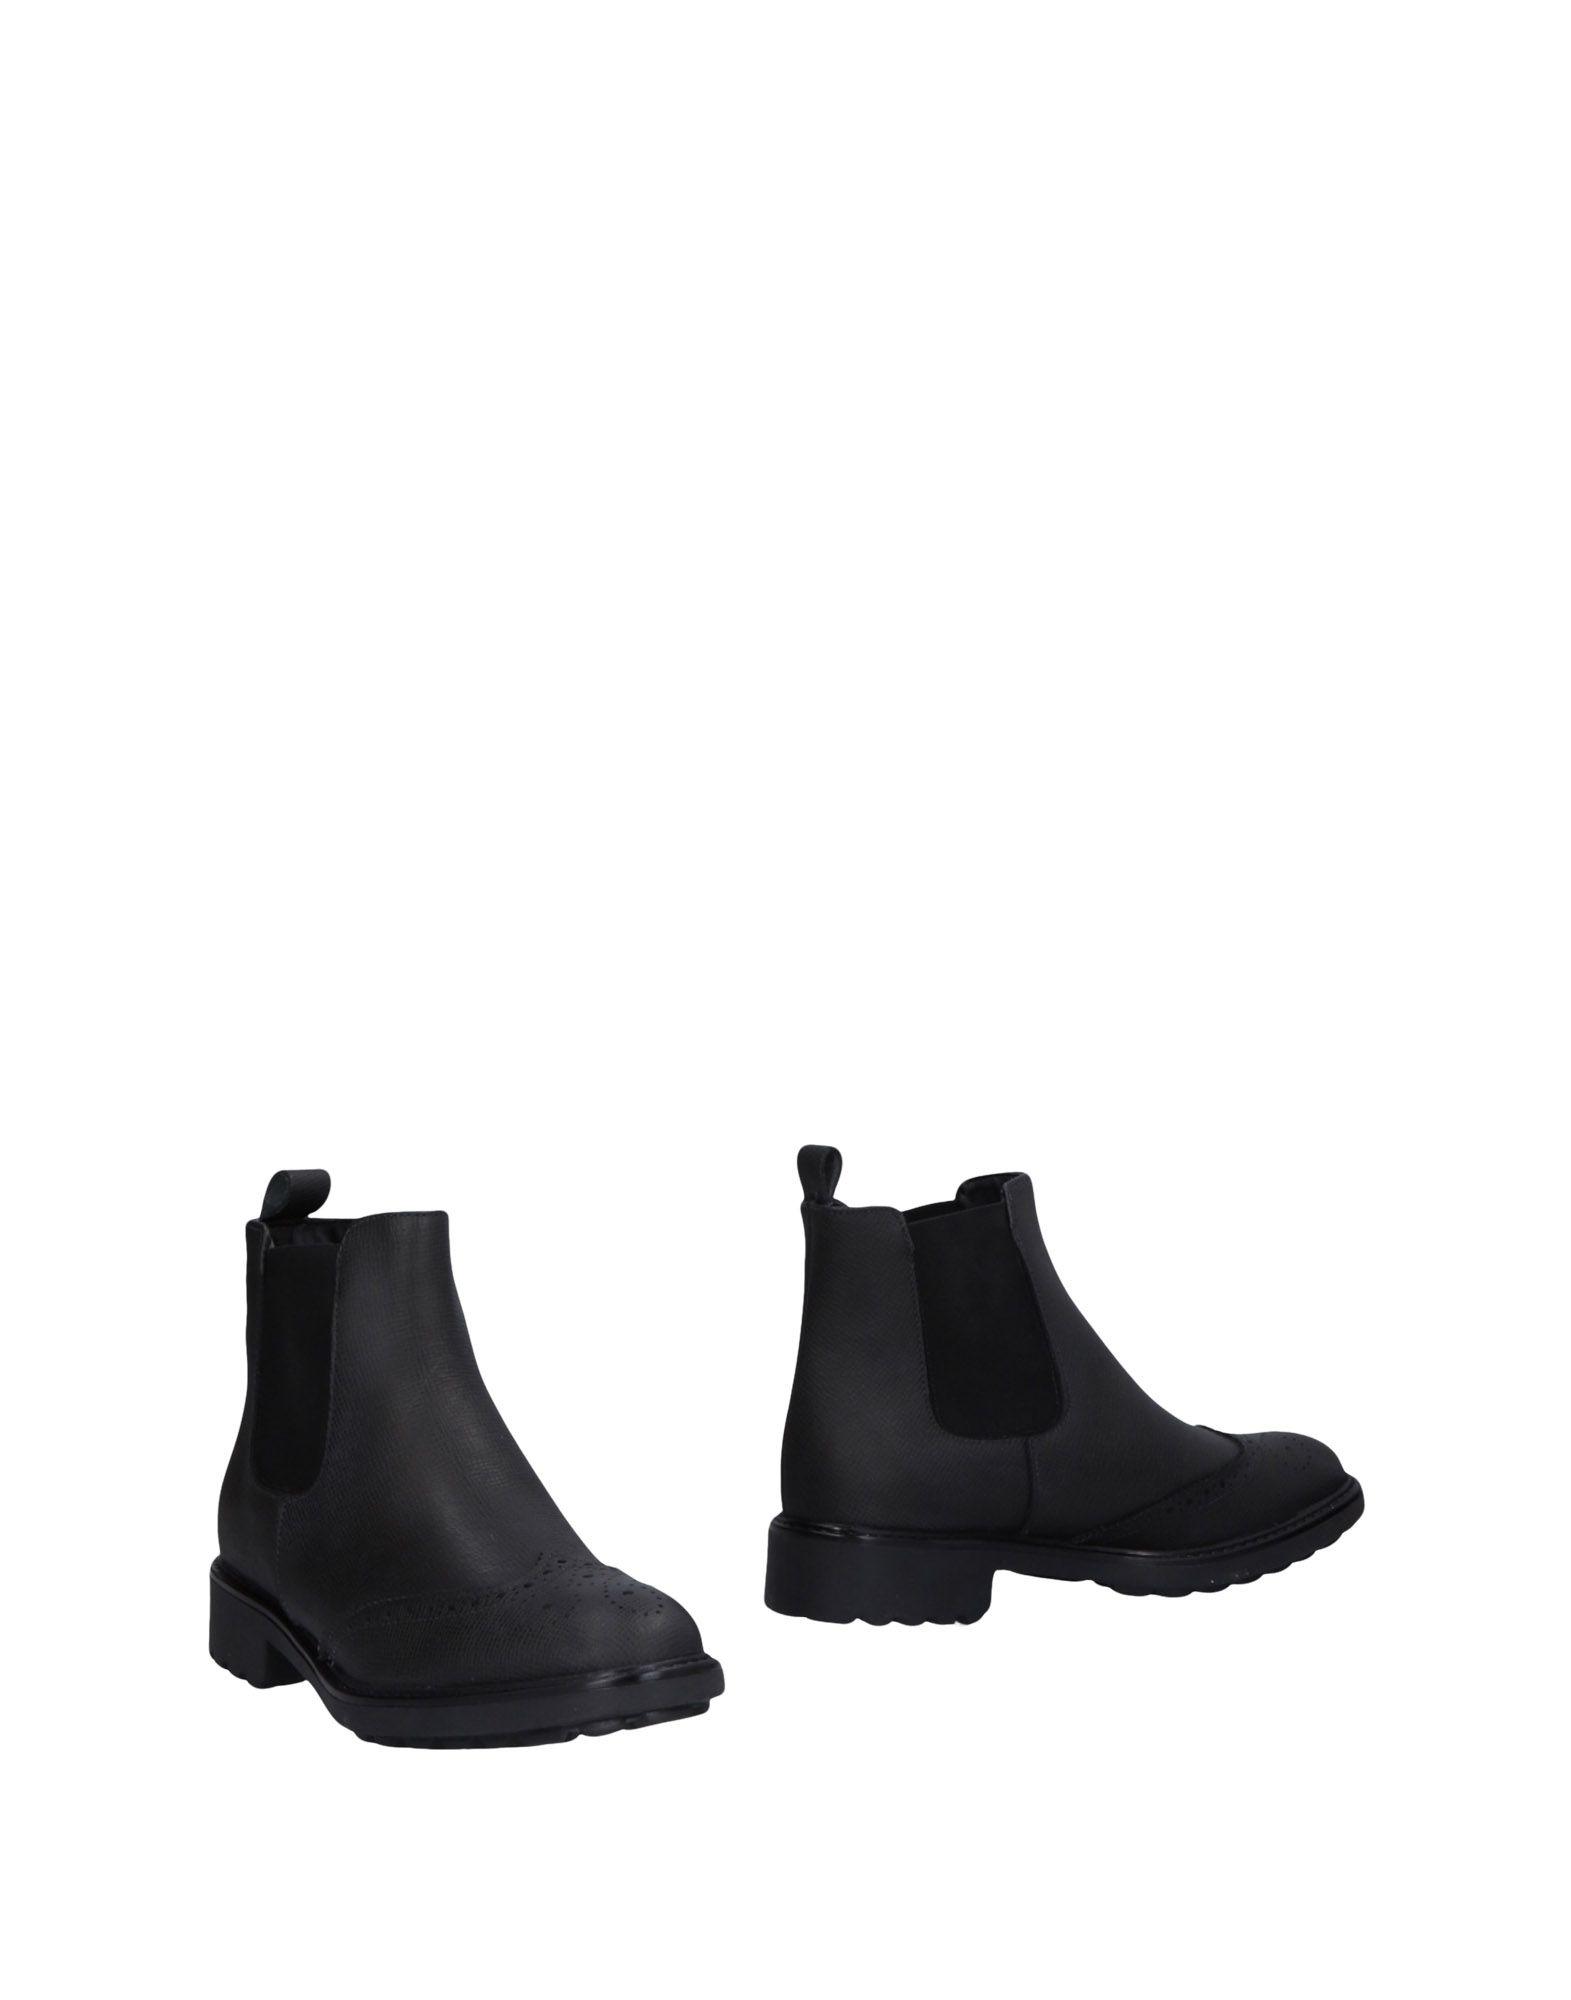 Unlace Chelsea Boots Damen  11475261FP Gute Qualität beliebte Schuhe